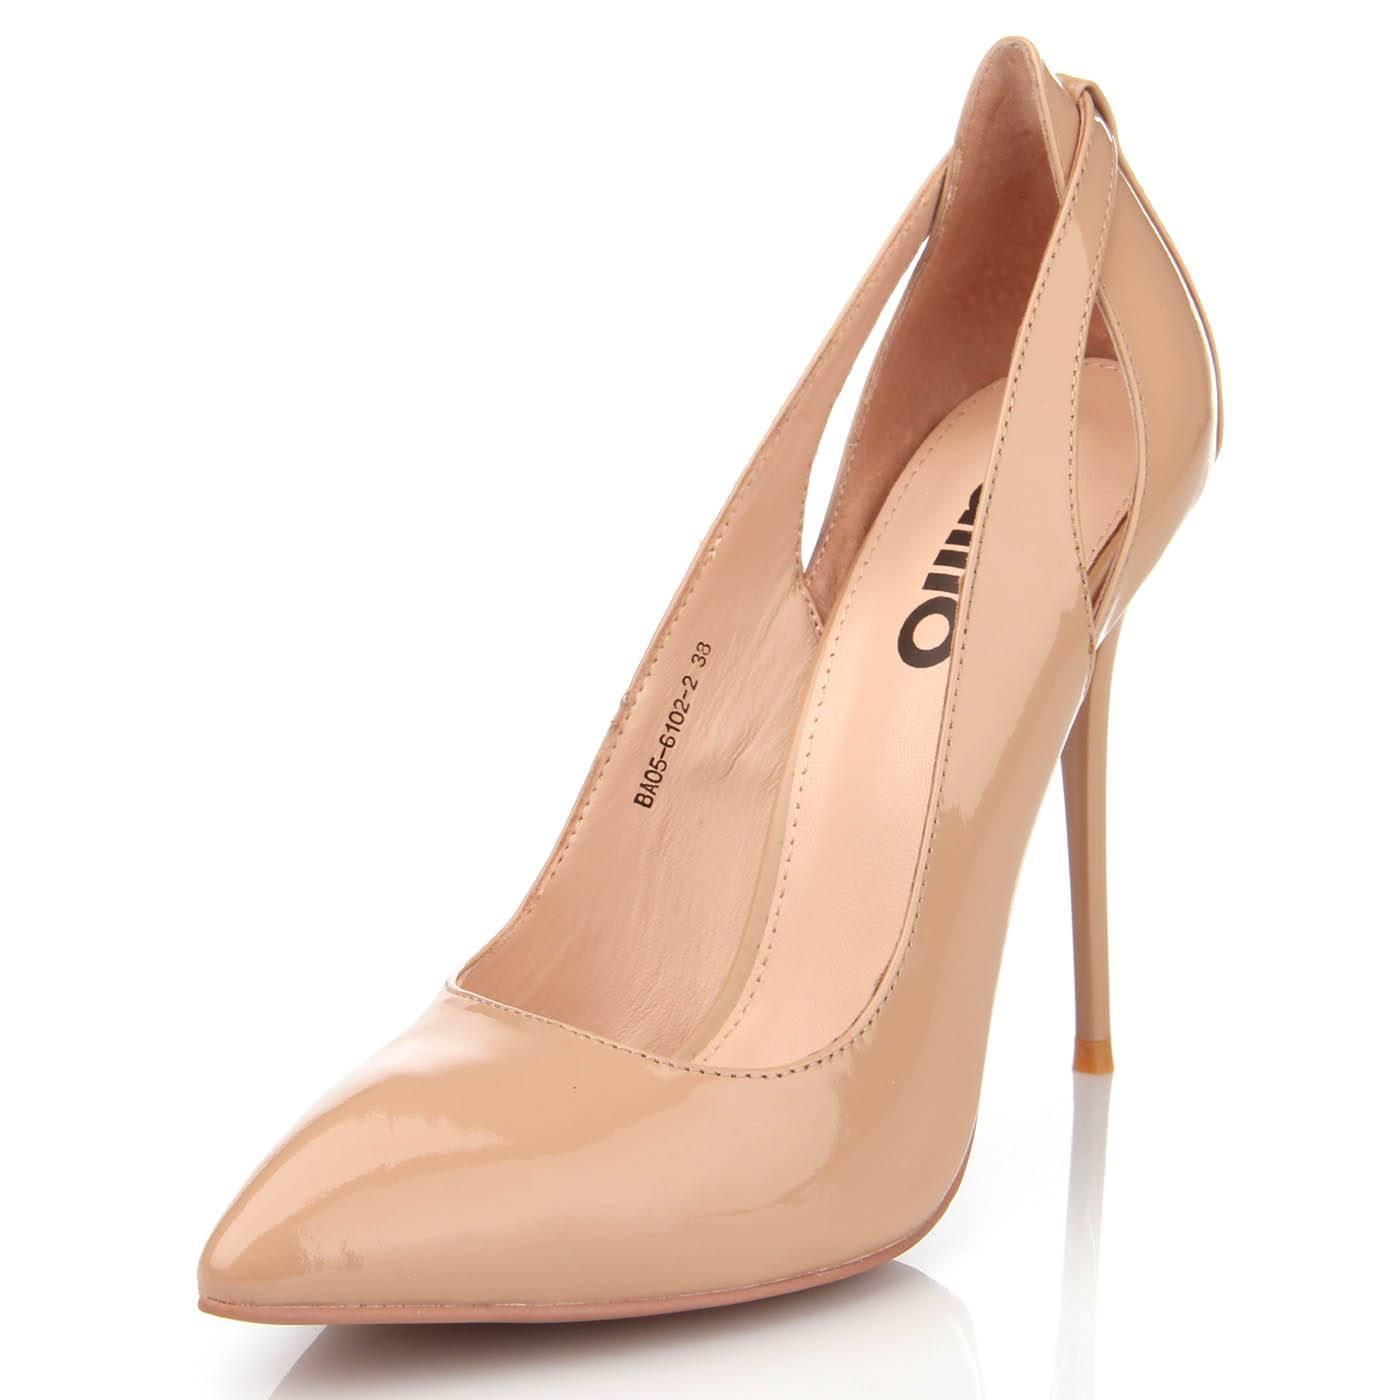 Туфлі жіночі ditto 6472 Бежевий купить по выгодной цене в интернет ... 4b83a56c87a36